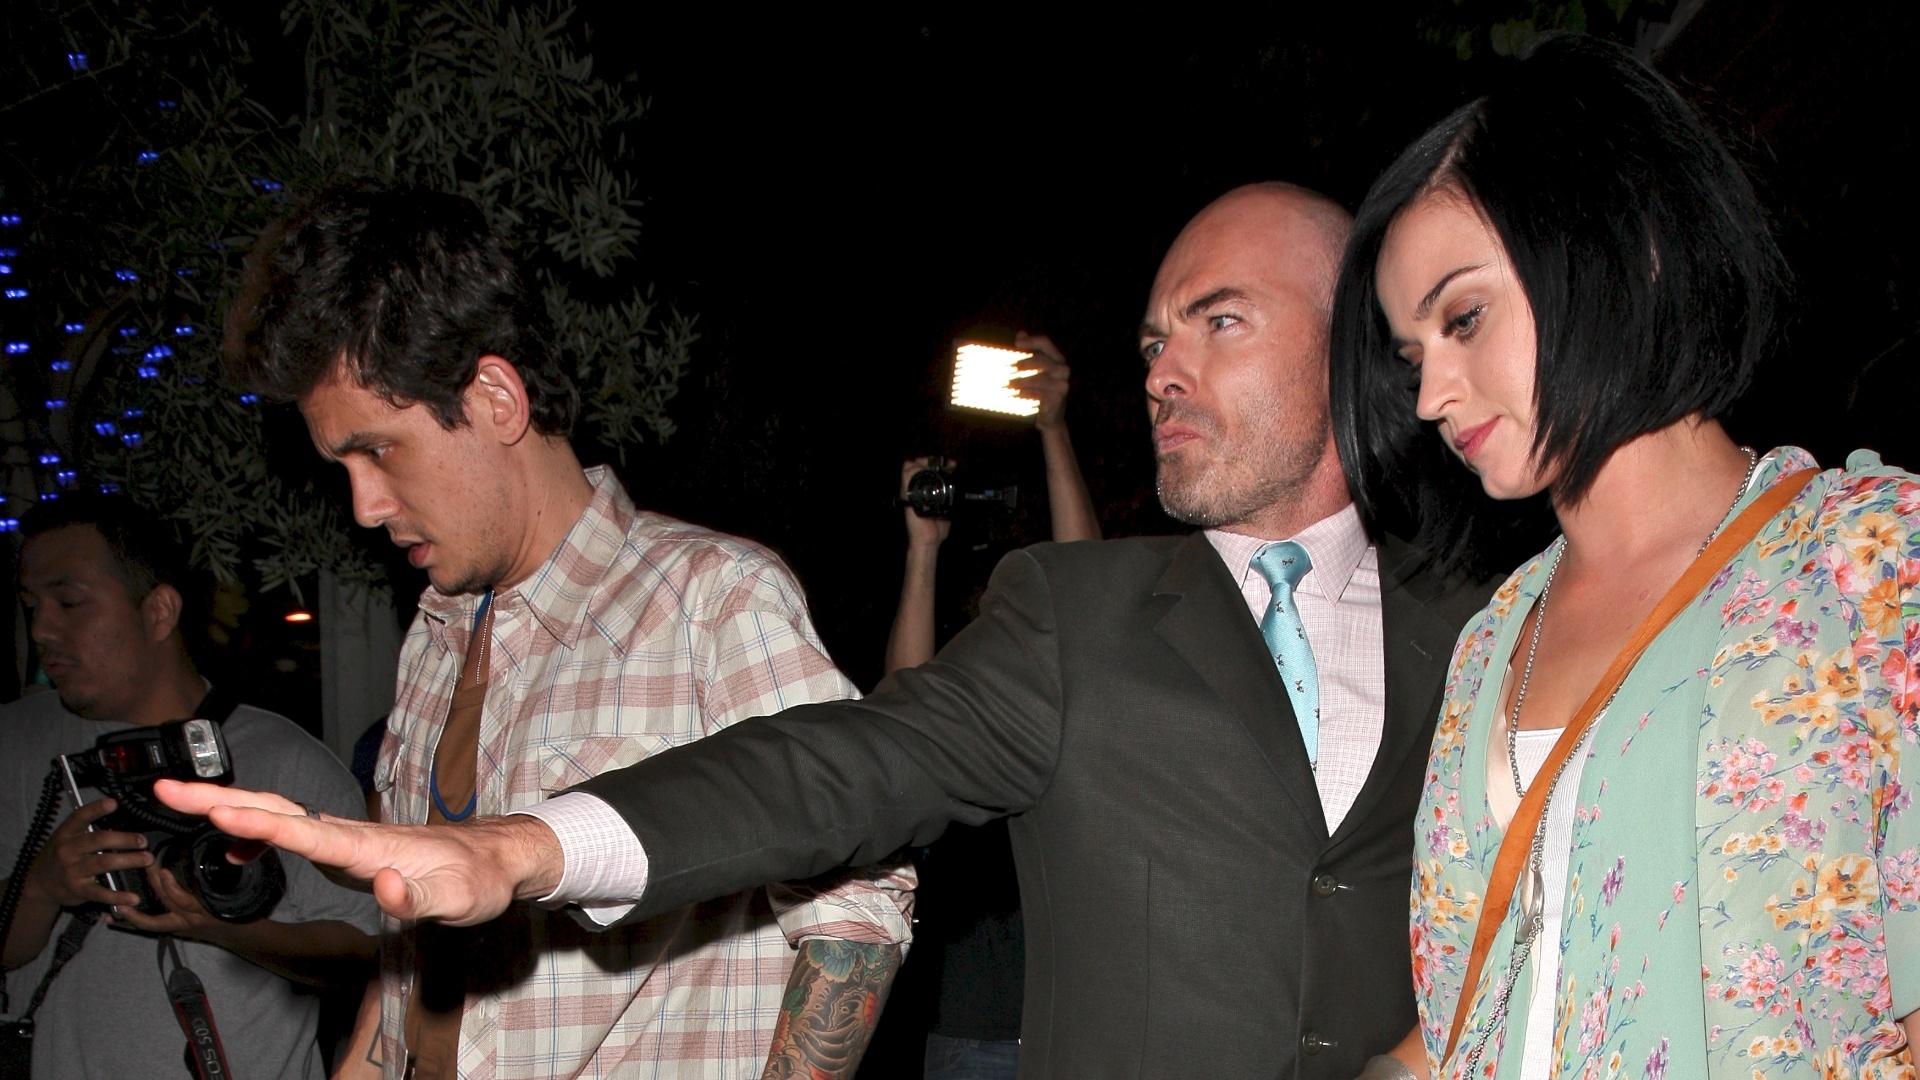 Katy Perry e John Mayer deixam restaurante escoltados por segurança (4/9/12)